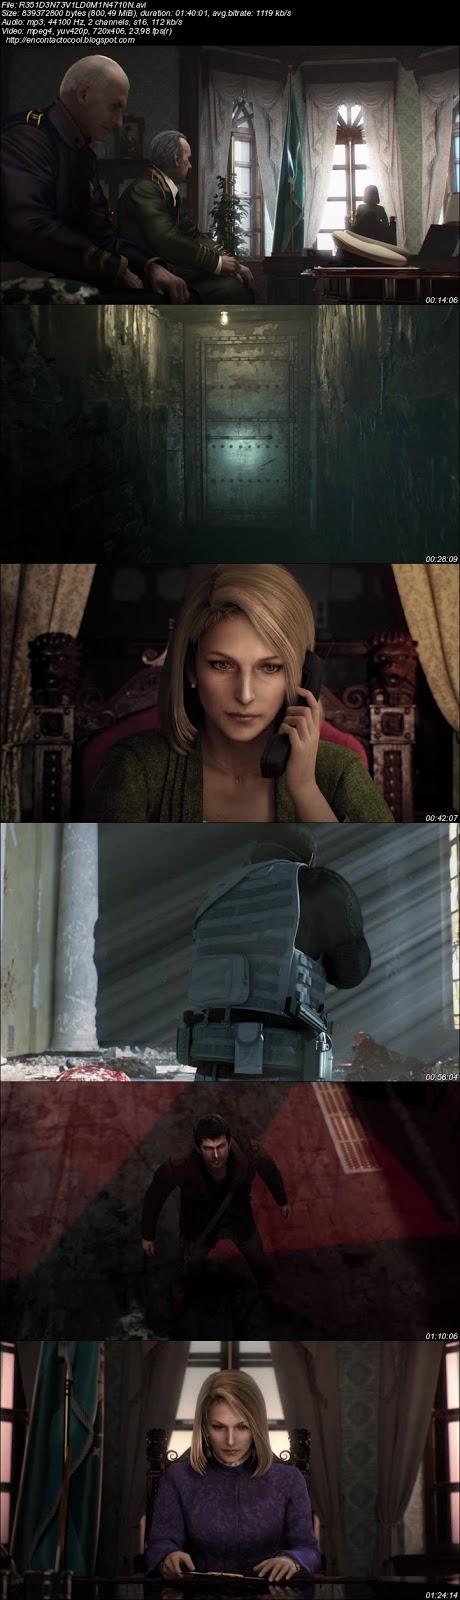 Resident Evil Damnation 2012 imágenes película